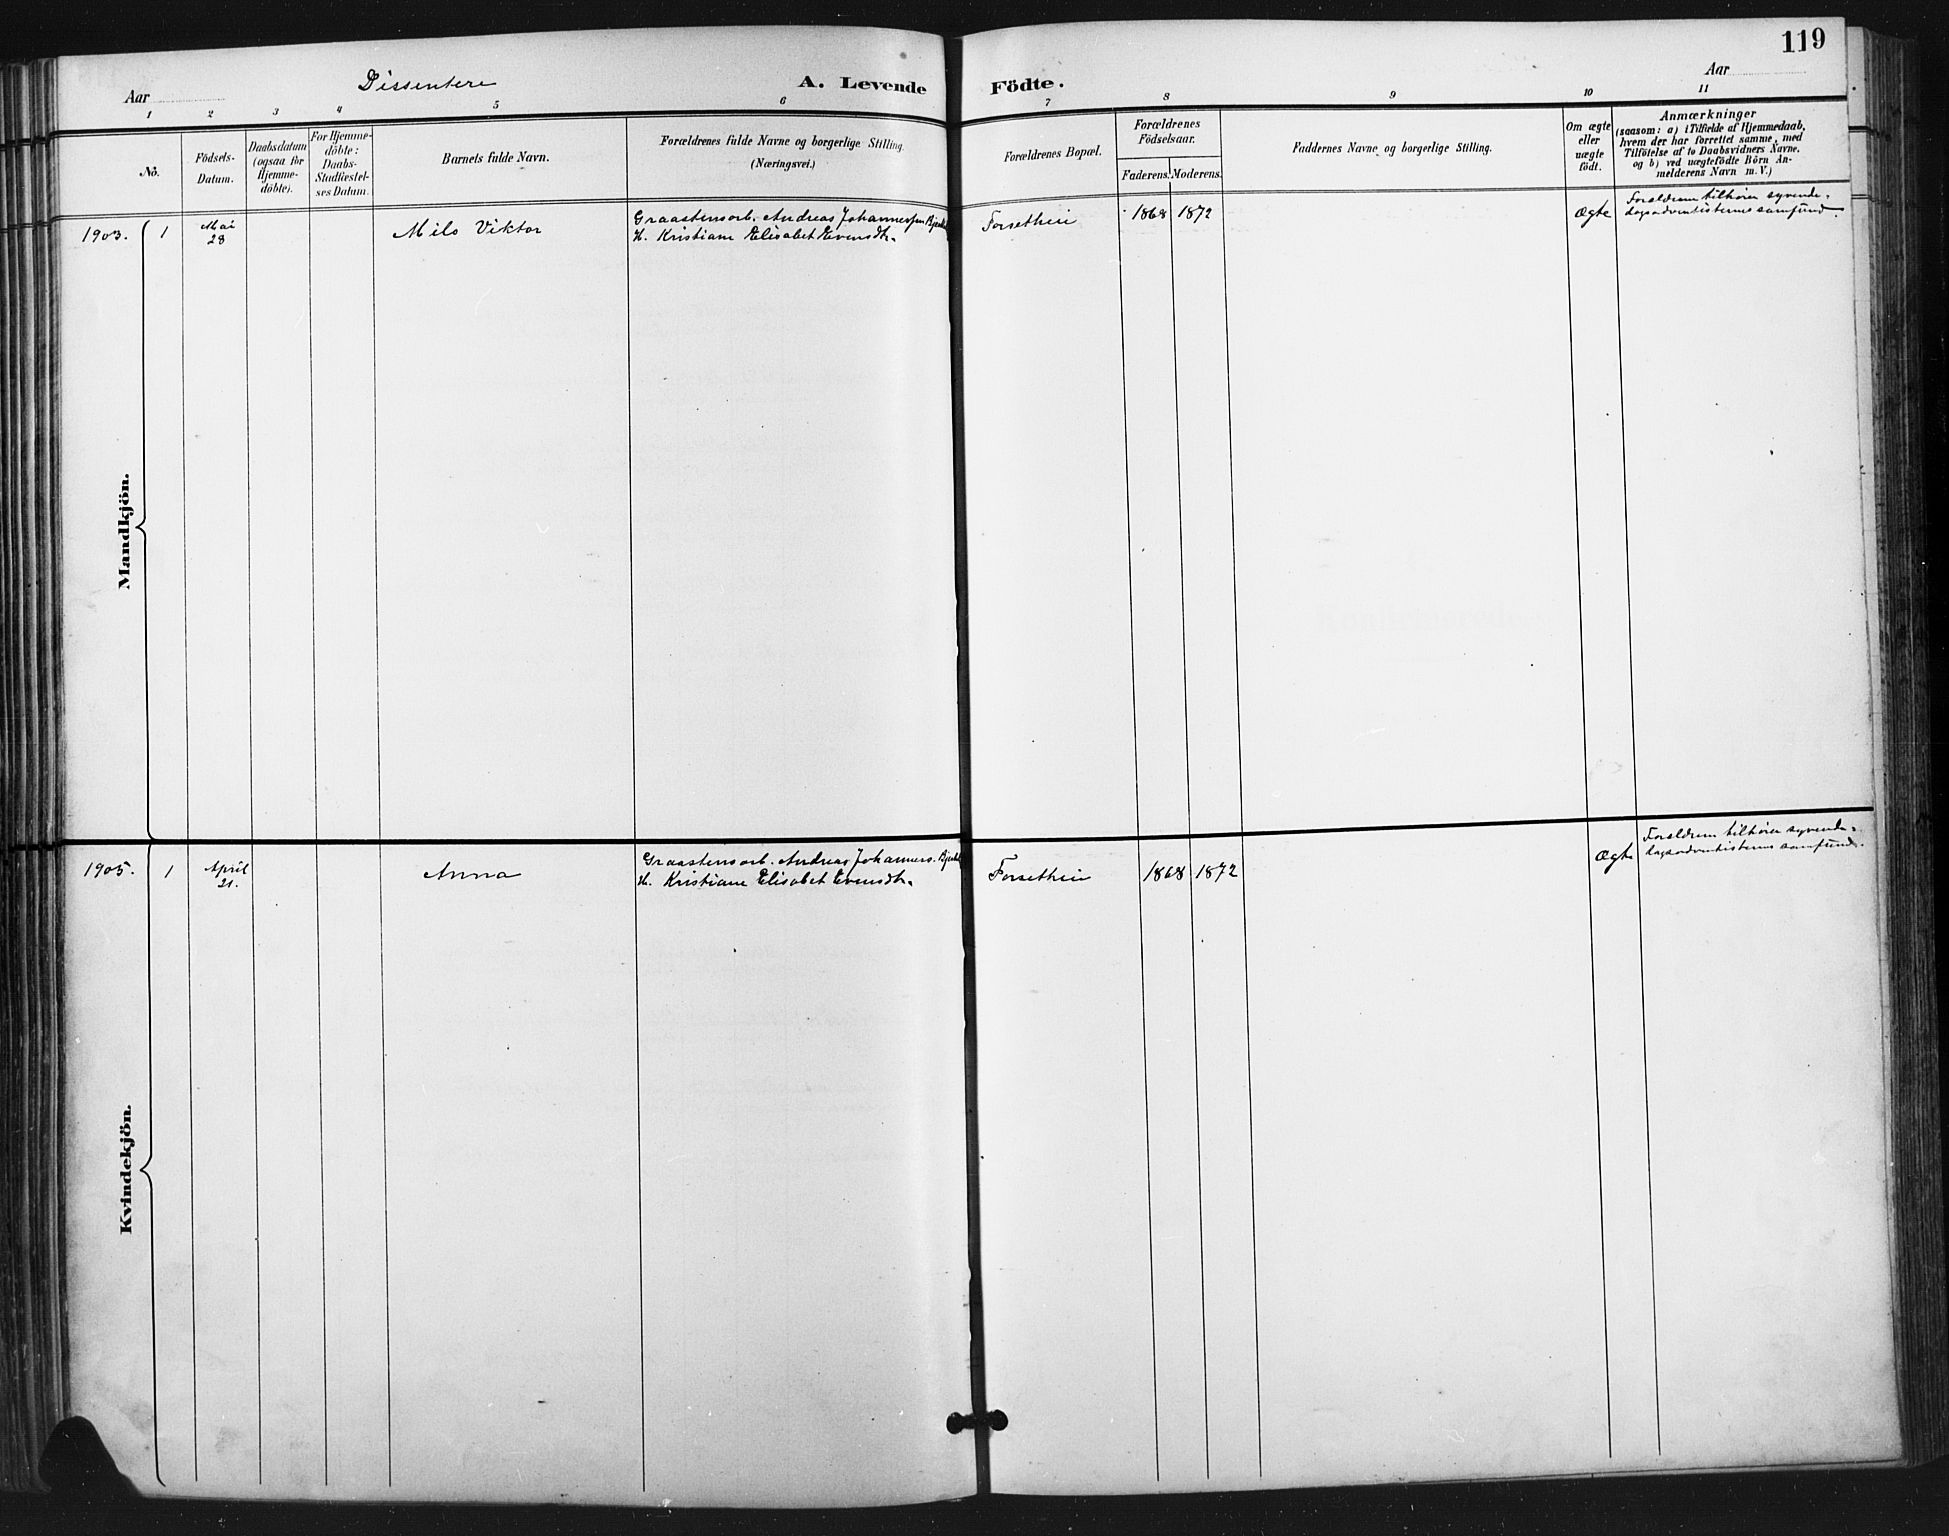 SAH, Vestre Gausdal prestekontor, Klokkerbok nr. 3, 1896-1925, s. 119